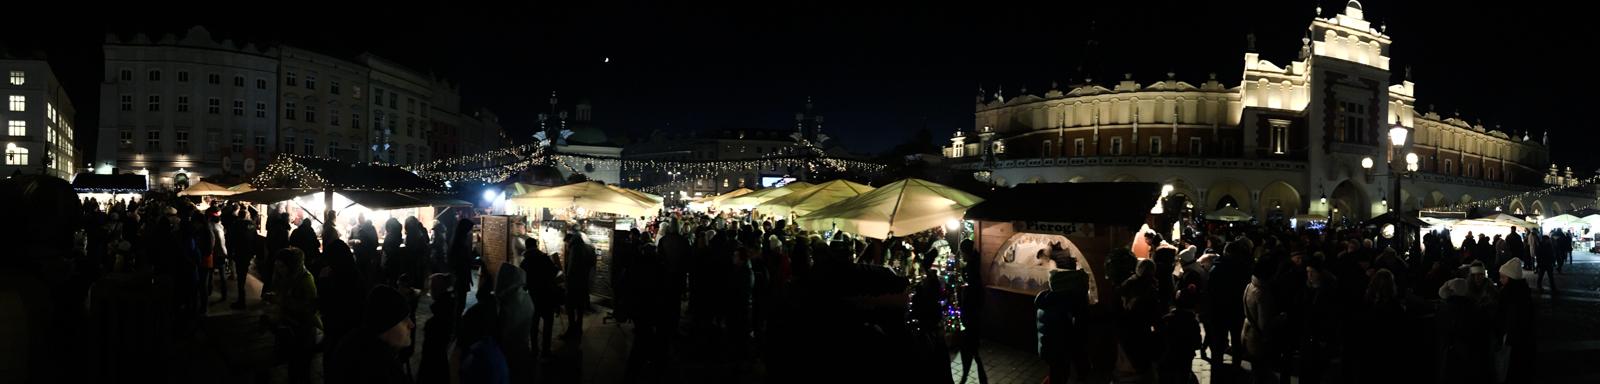 krakow-2016-robertiaga